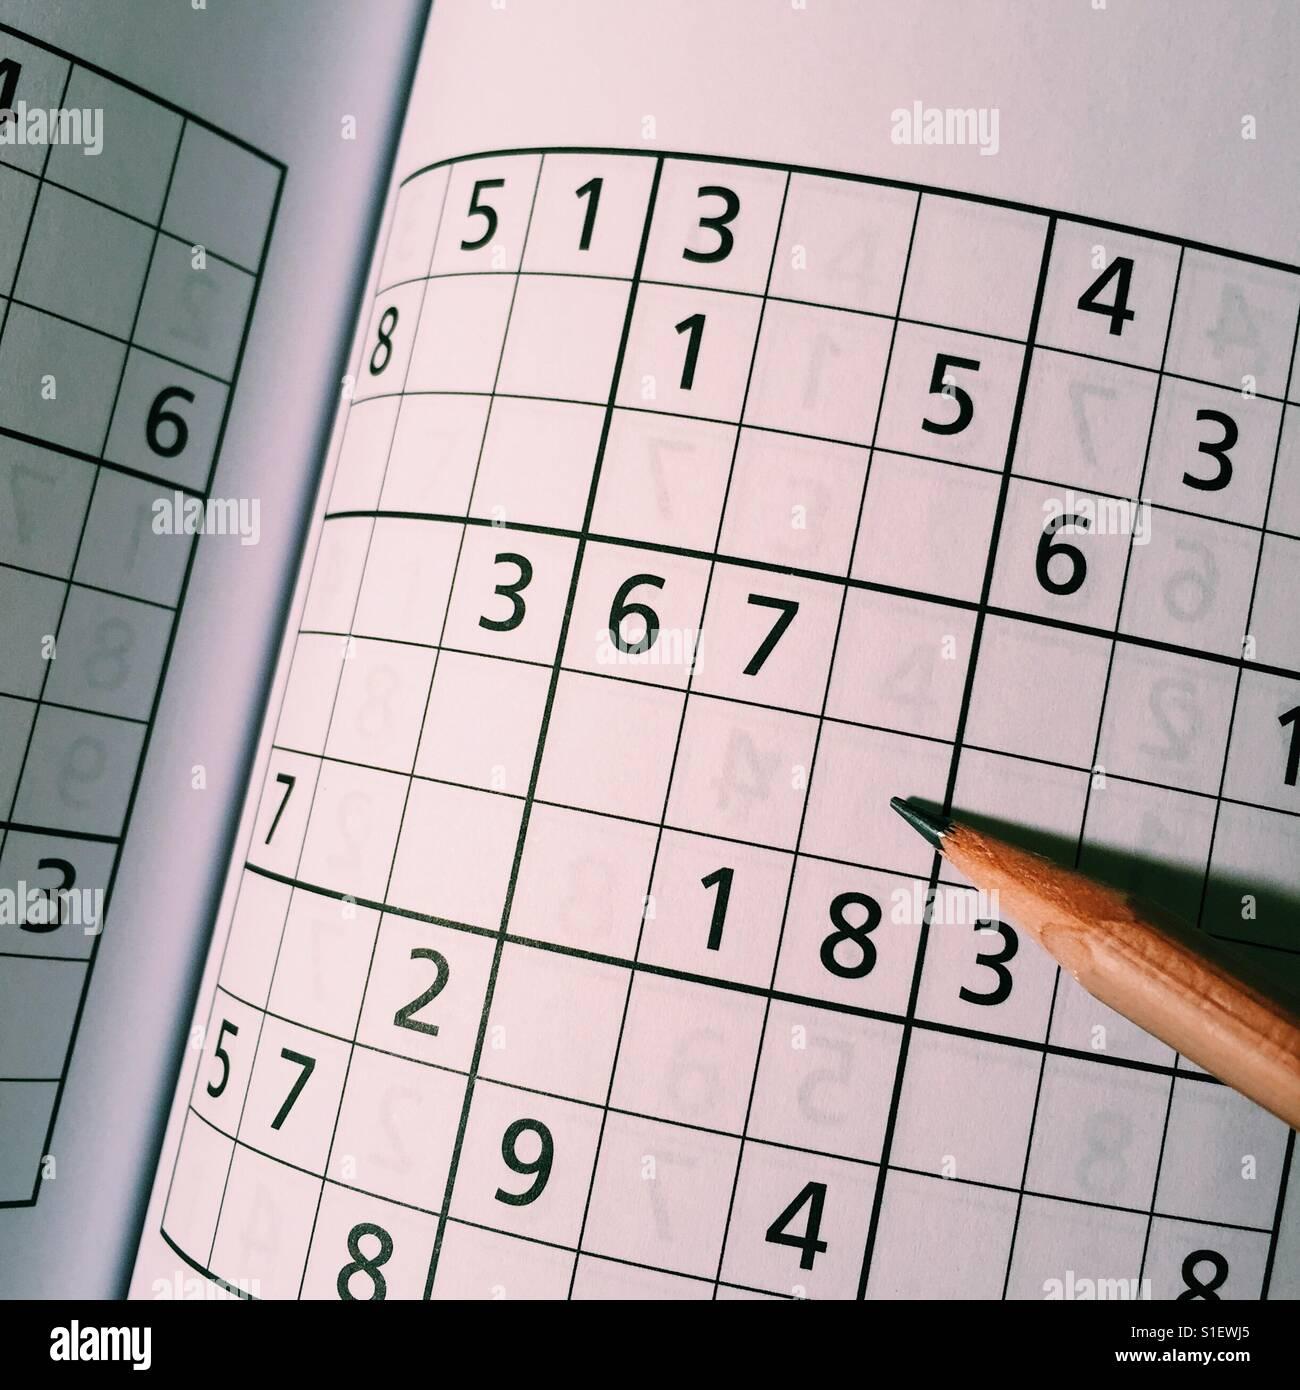 Brain Puzzles Book Stock Photos & Brain Puzzles Book Stock Images